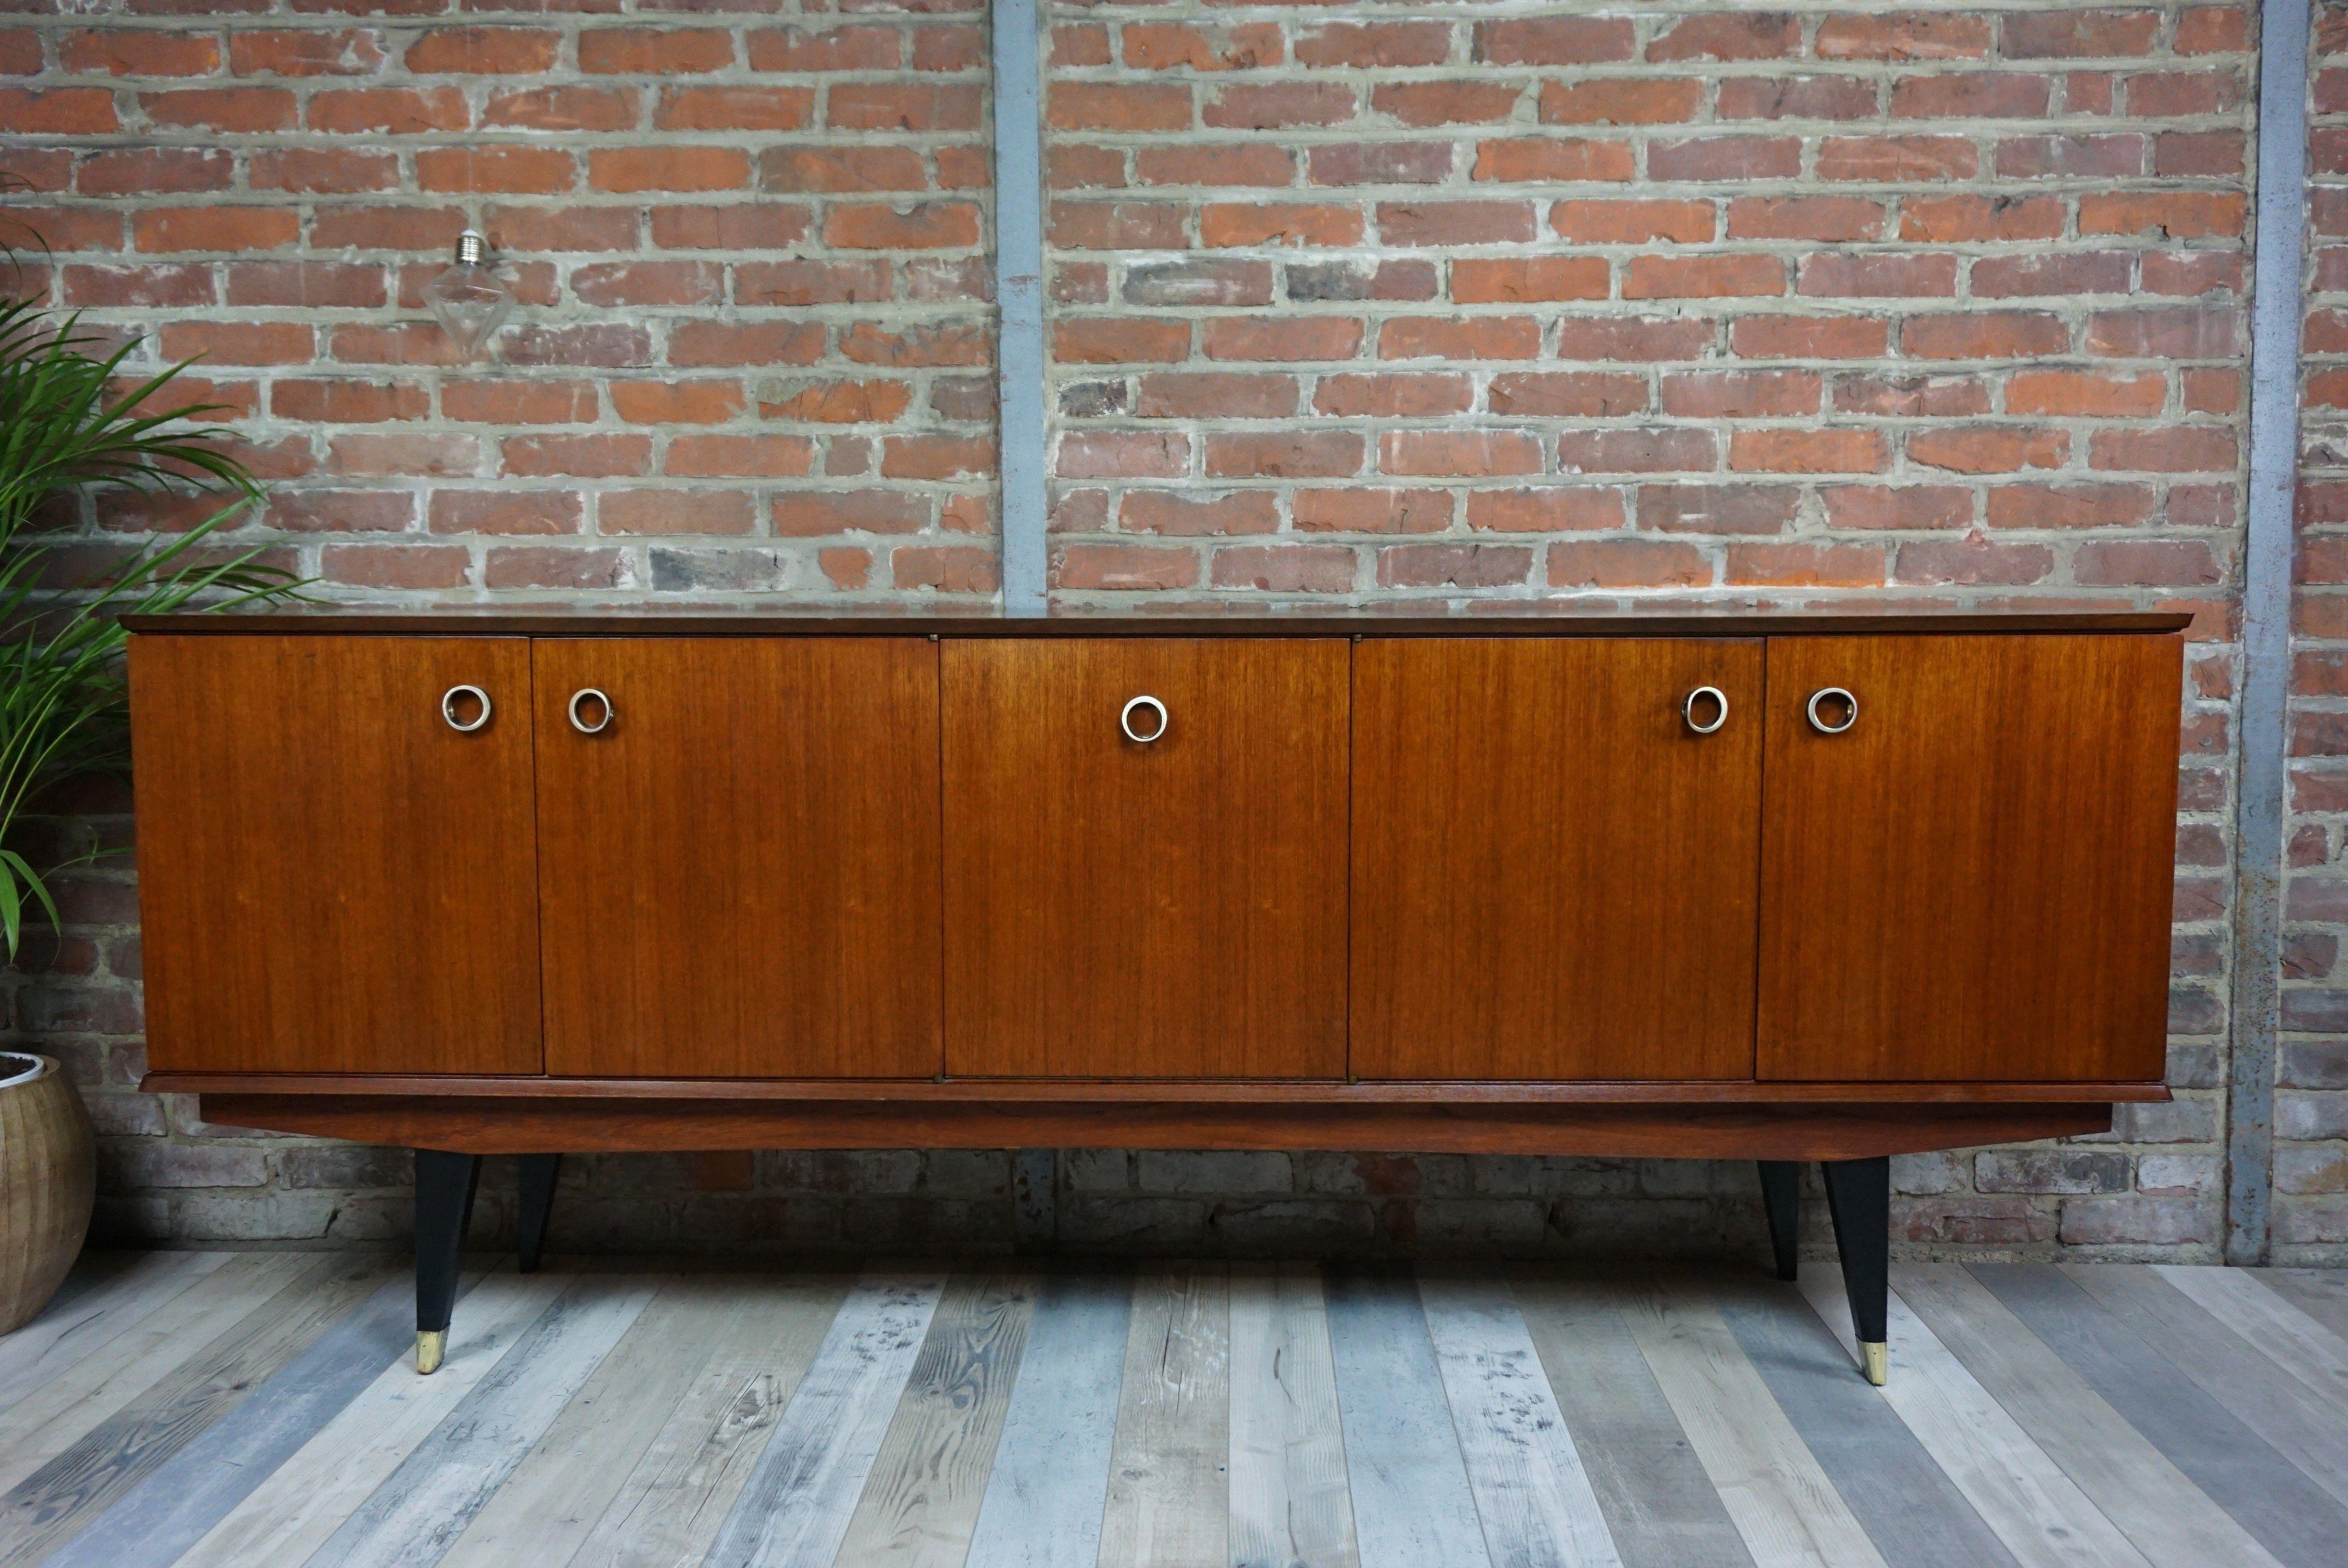 Enfilade En Teck Sideboard Annees 50 60 D Occasion Vintage Design Scandinave Industriel Ancien Vendu Sur Collector Chic Depo Decor Home Decor Furniture